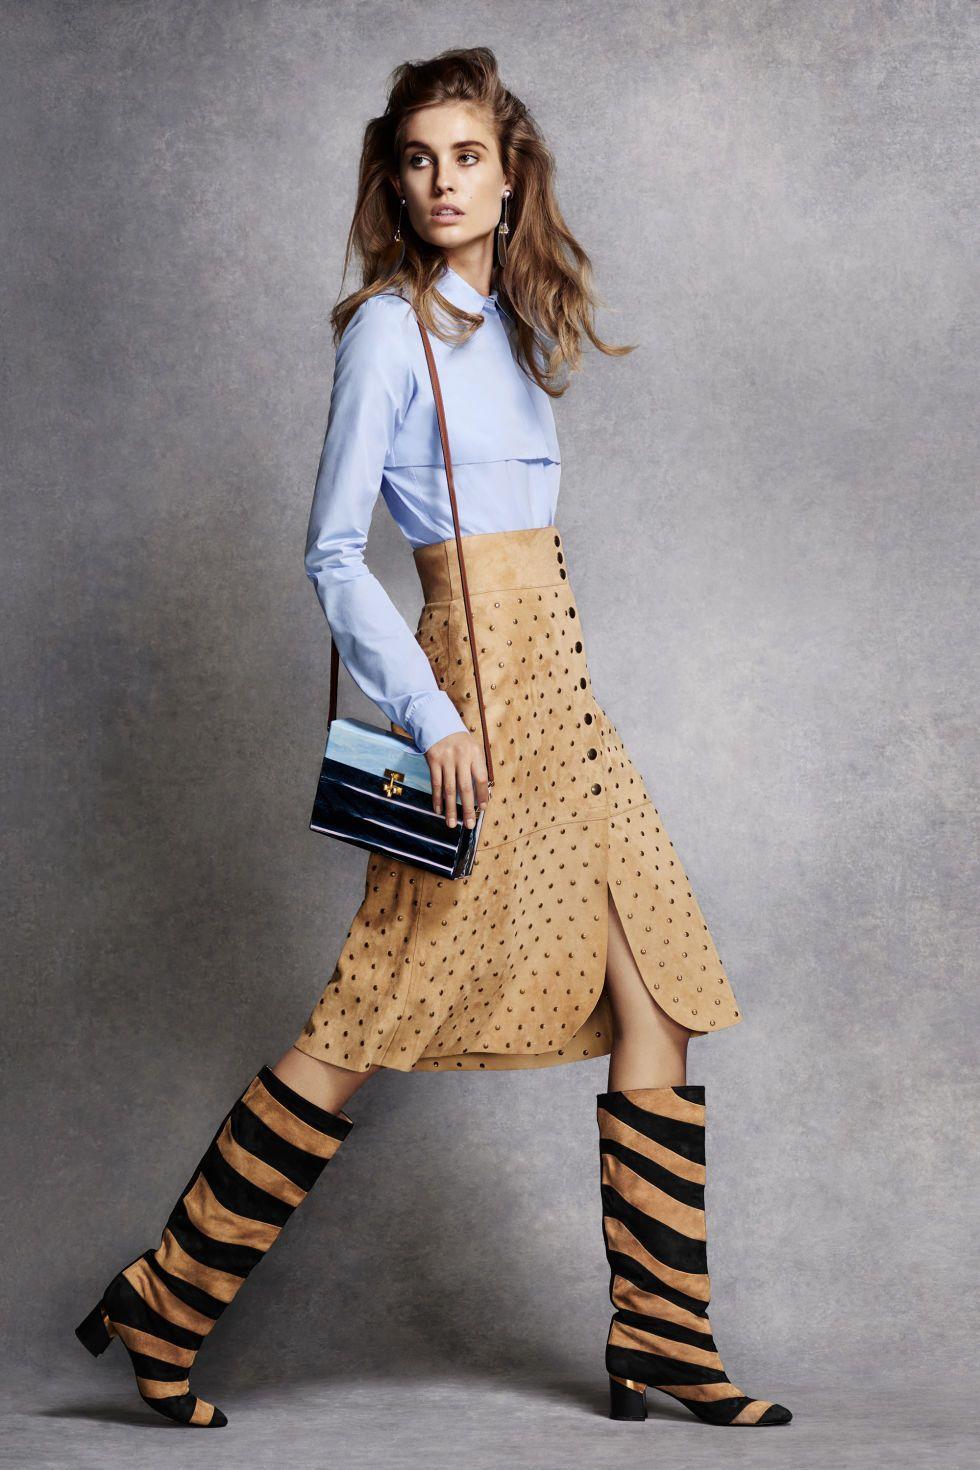 76350c1ee51e Nina Ricci top, $590, Ikram Chicago, 312-587-1000; Lanvin skirt, $5,150, Saks  Fifth Avenue, 212-753-4000, and boots, $1,650, 646-439-0308; Prada  earrings, .